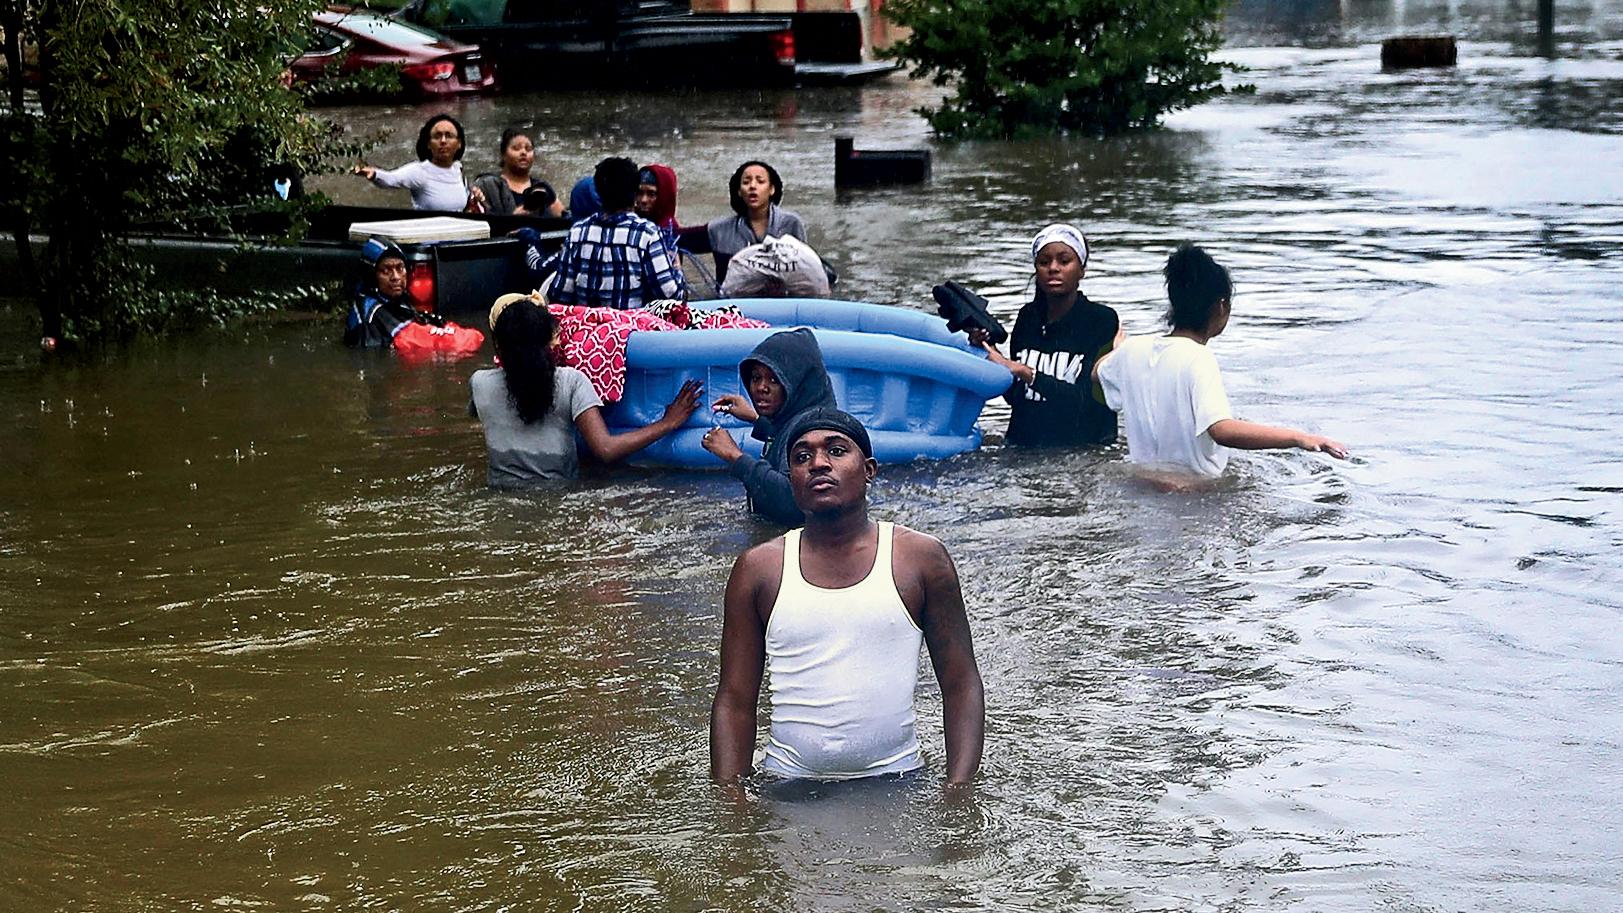 Houston: A Global Warning